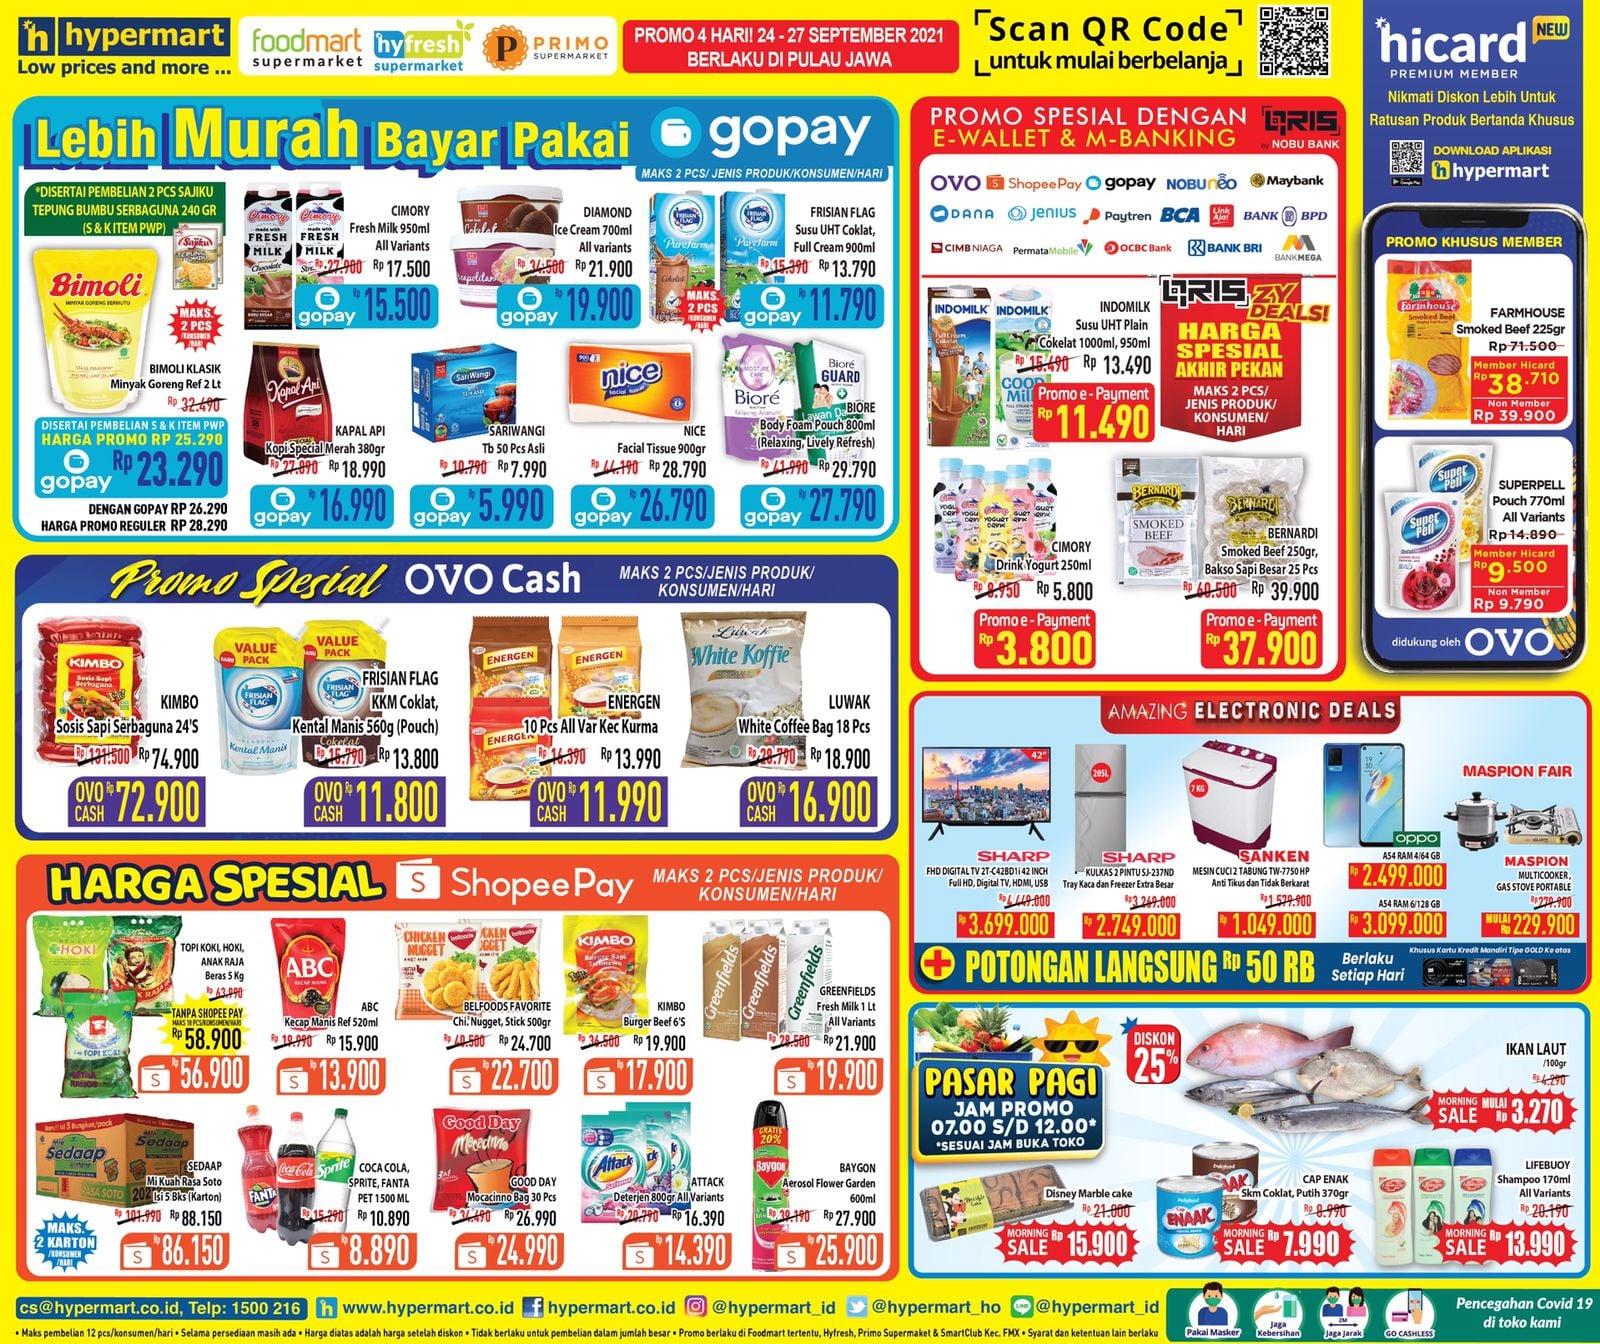 Promo Hypermart JSM Katalog Weekend periode 24-27 September 2021